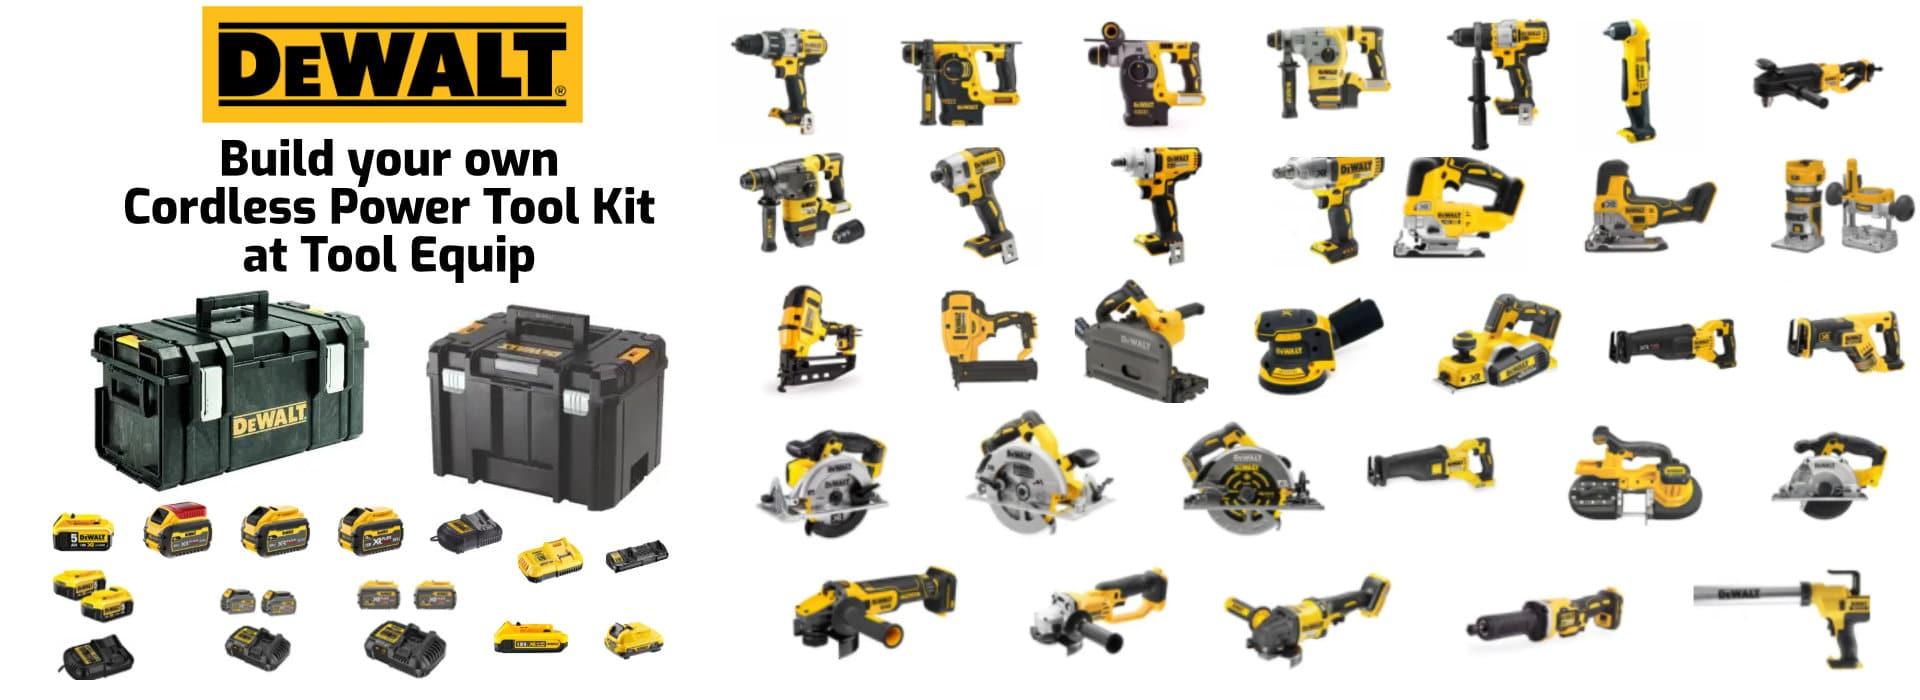 Make your own Dewalt power tool kit